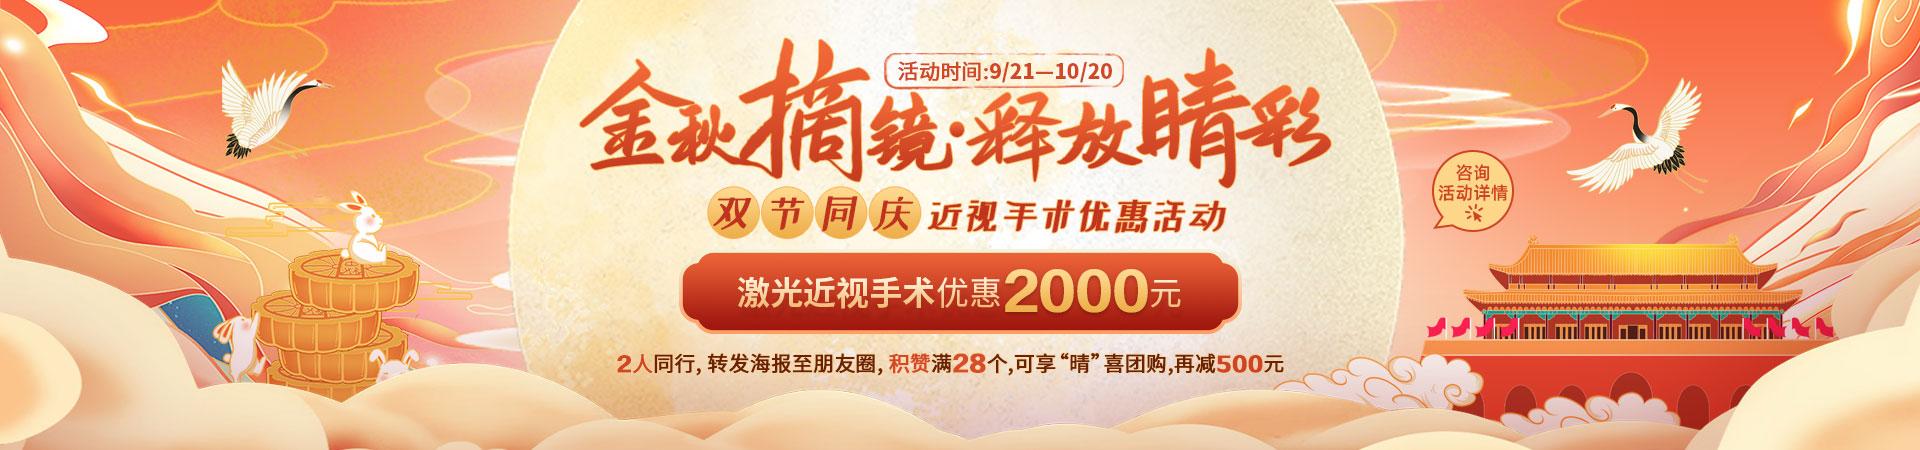 淮南国庆中秋活动banner